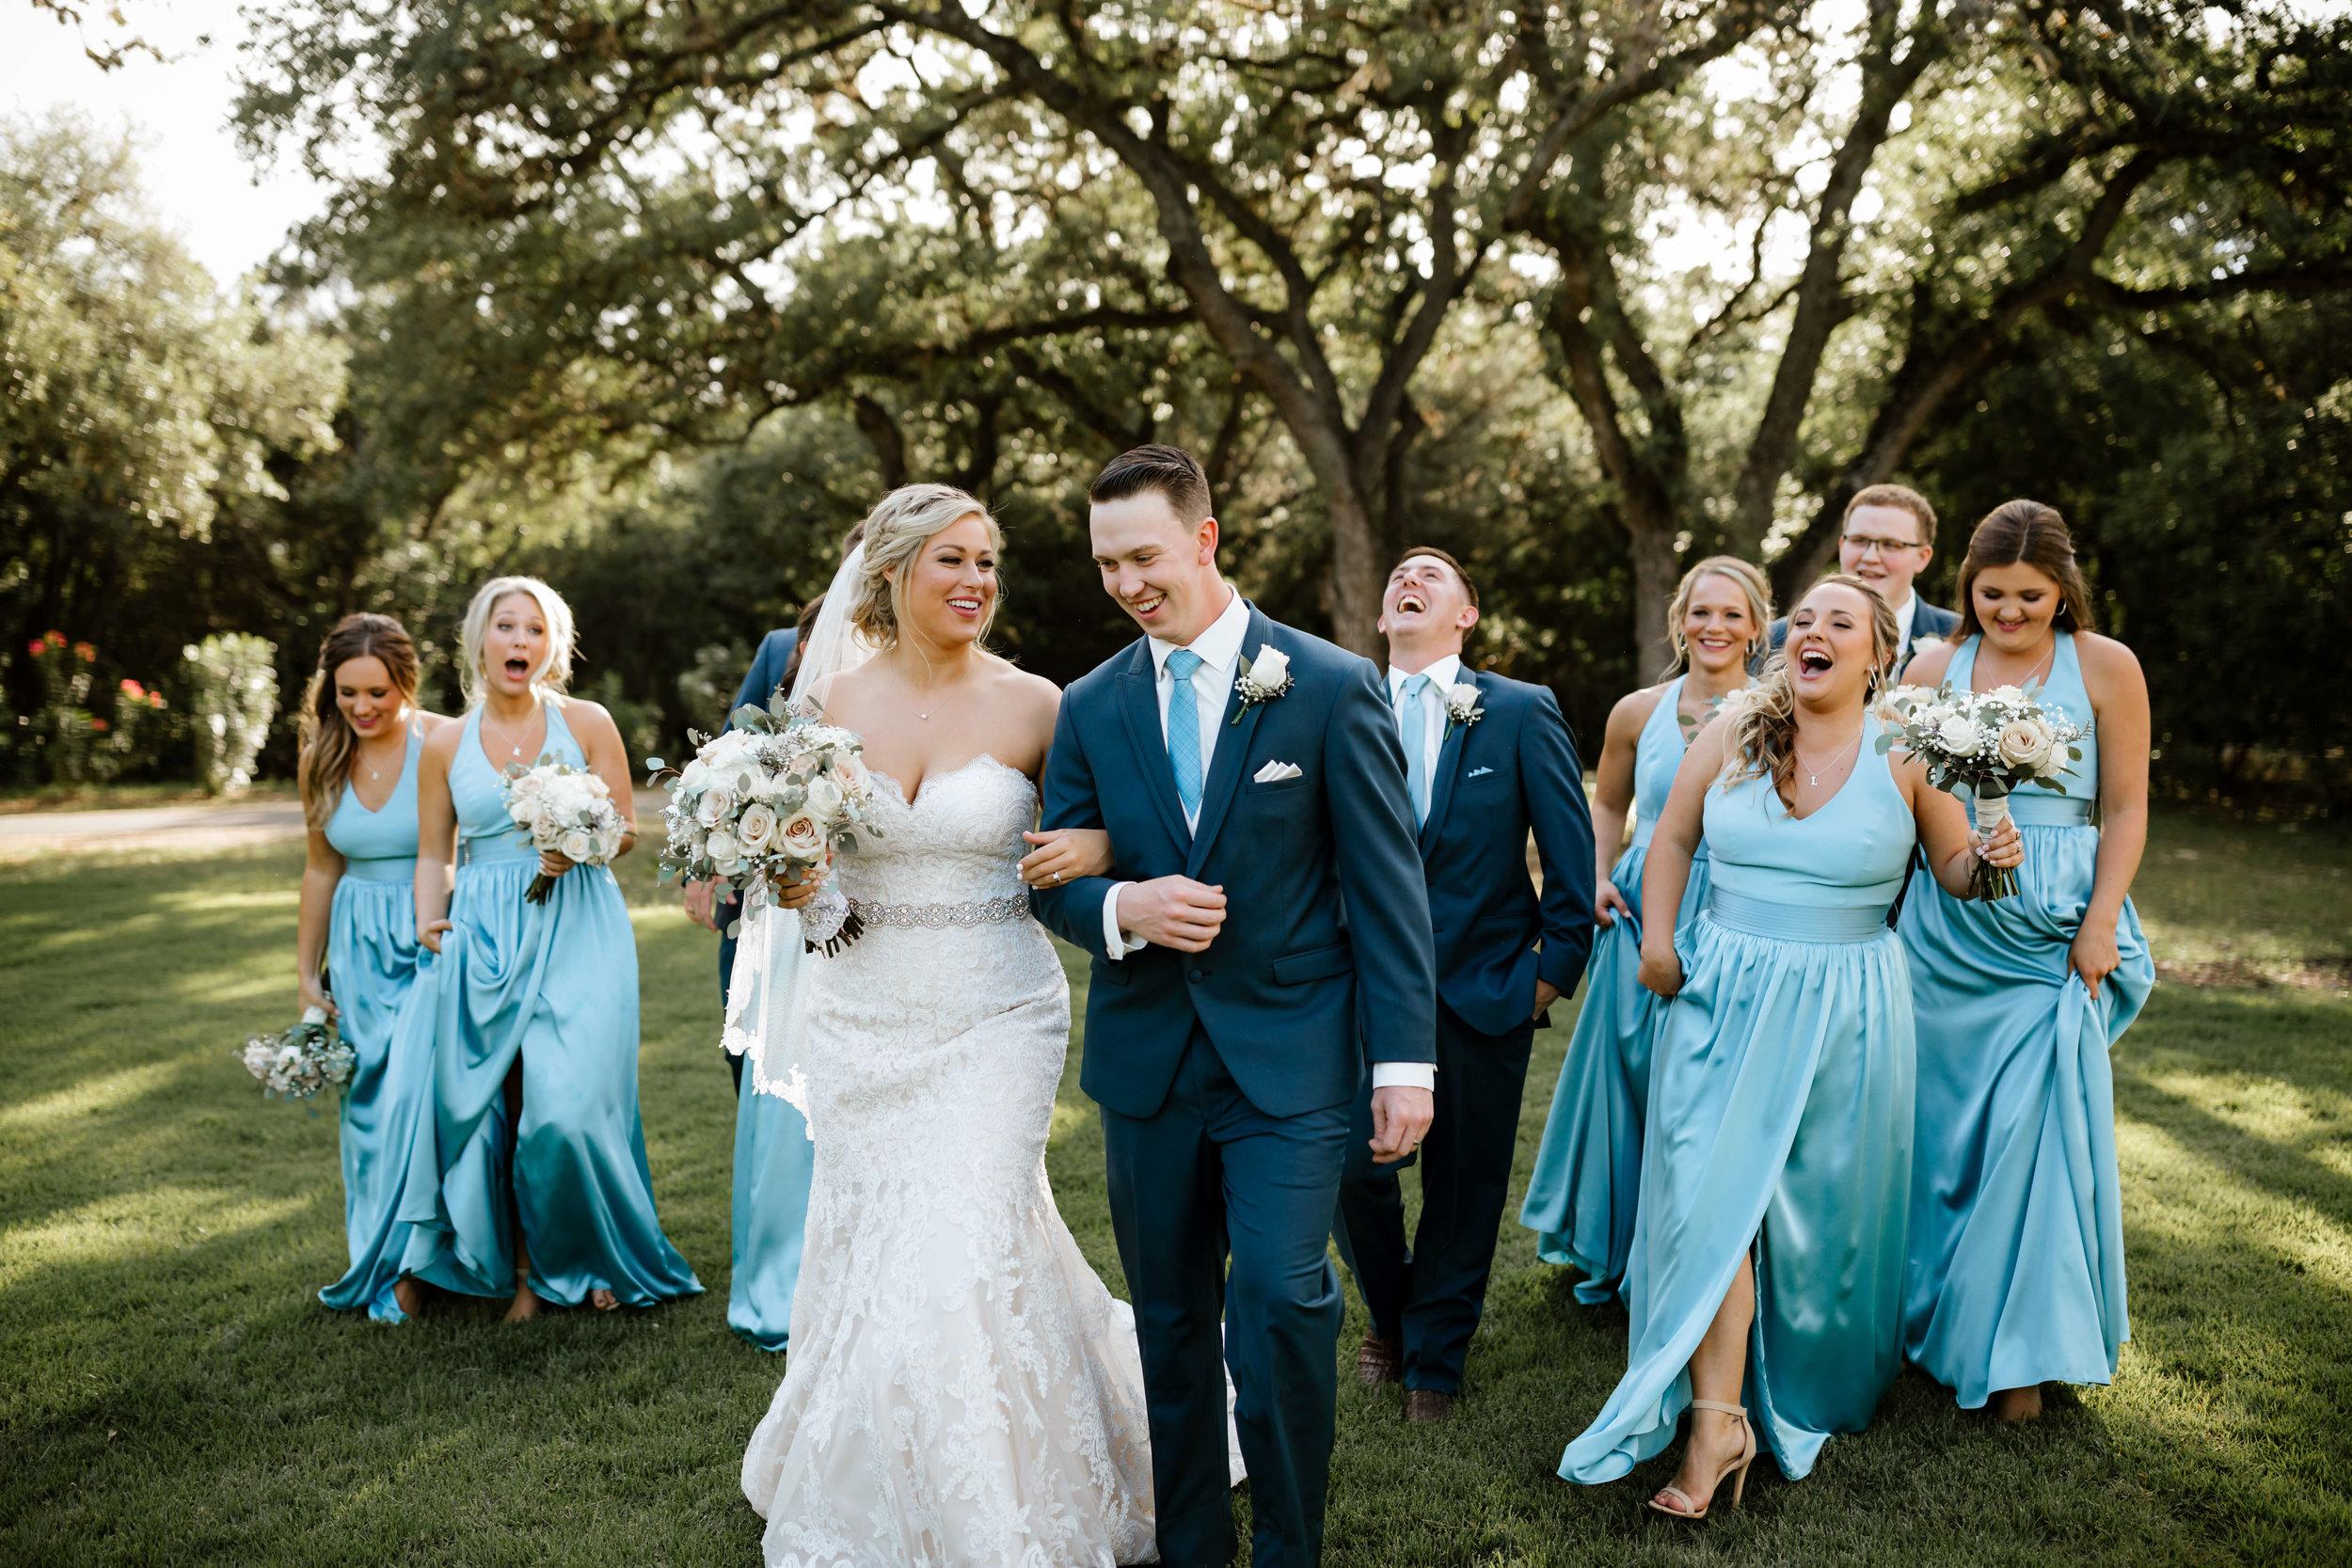 Courtney + Jack Tilson wedding-9222.jpg